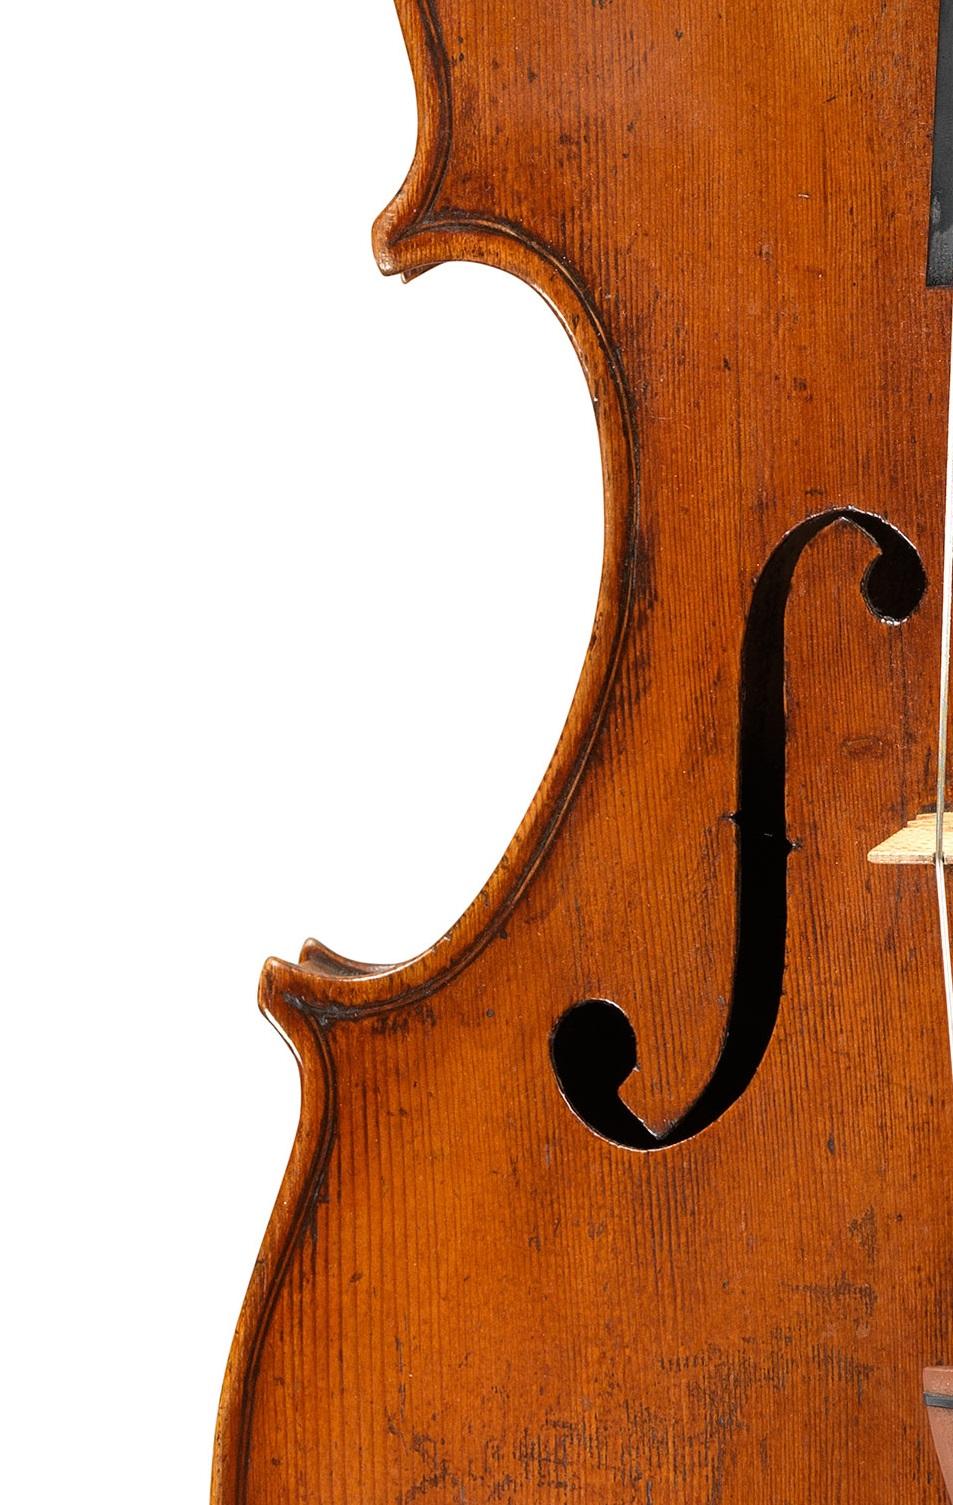 front of a viola by Giuseppe Dall'Aglio, Mantua, c1830